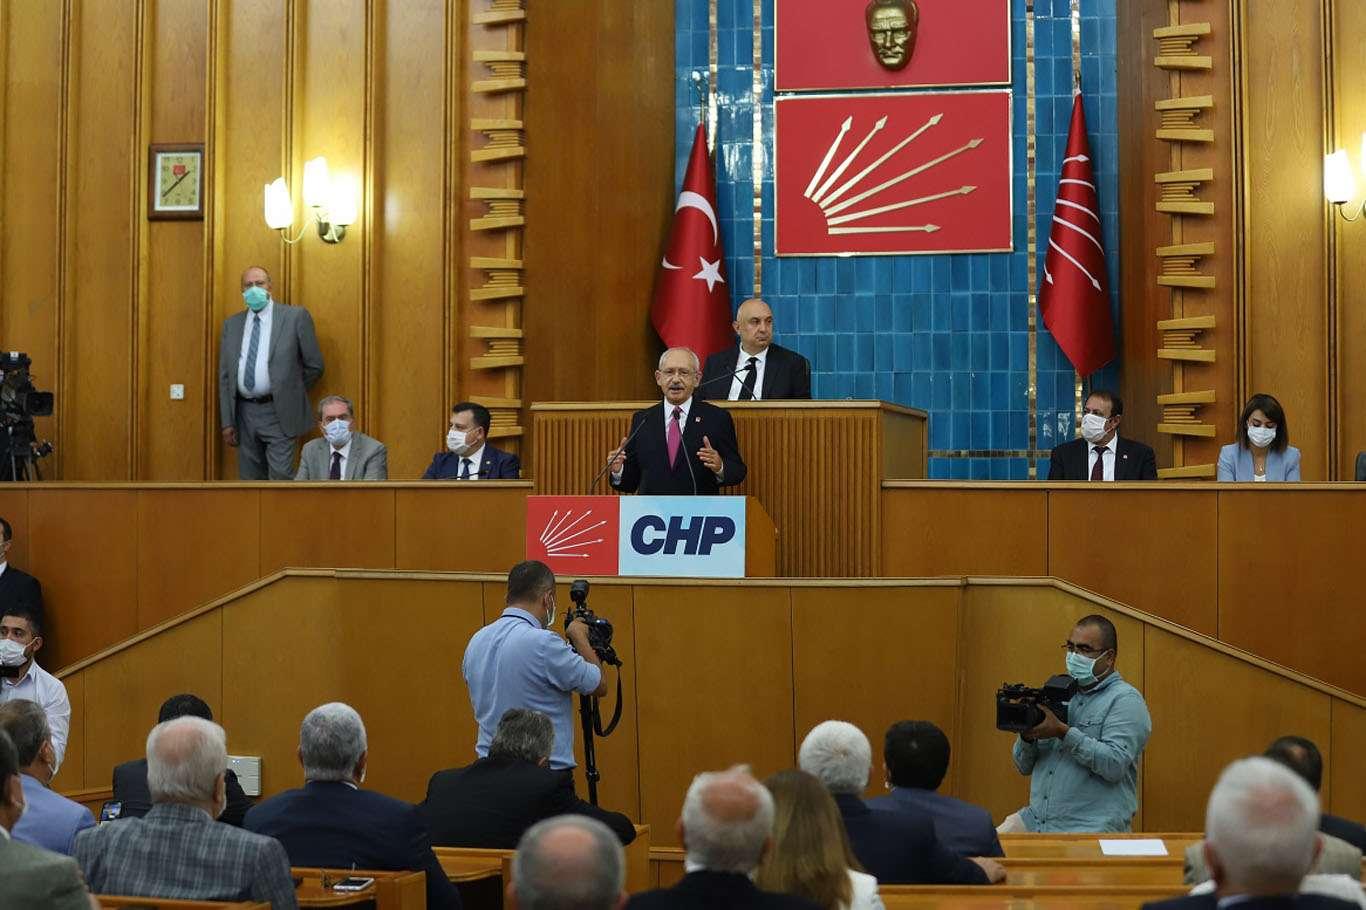 Parti Politikasından Rahatsız Olan Chp'li 3 Vekil İstifa Etti